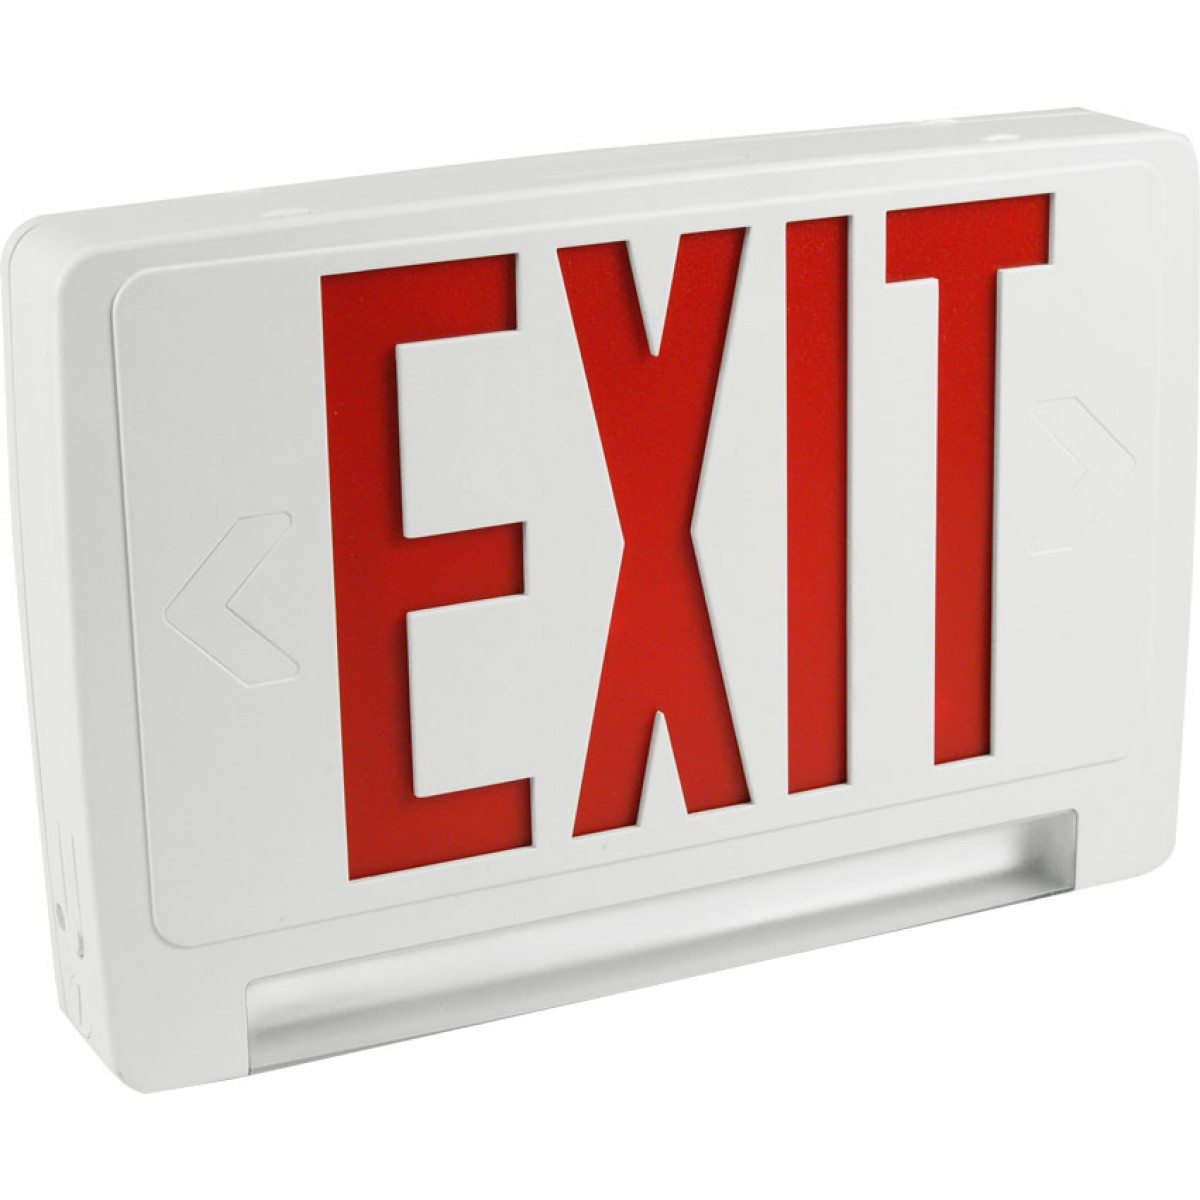 eeclp led exit sign emergency light combo exit. Black Bedroom Furniture Sets. Home Design Ideas